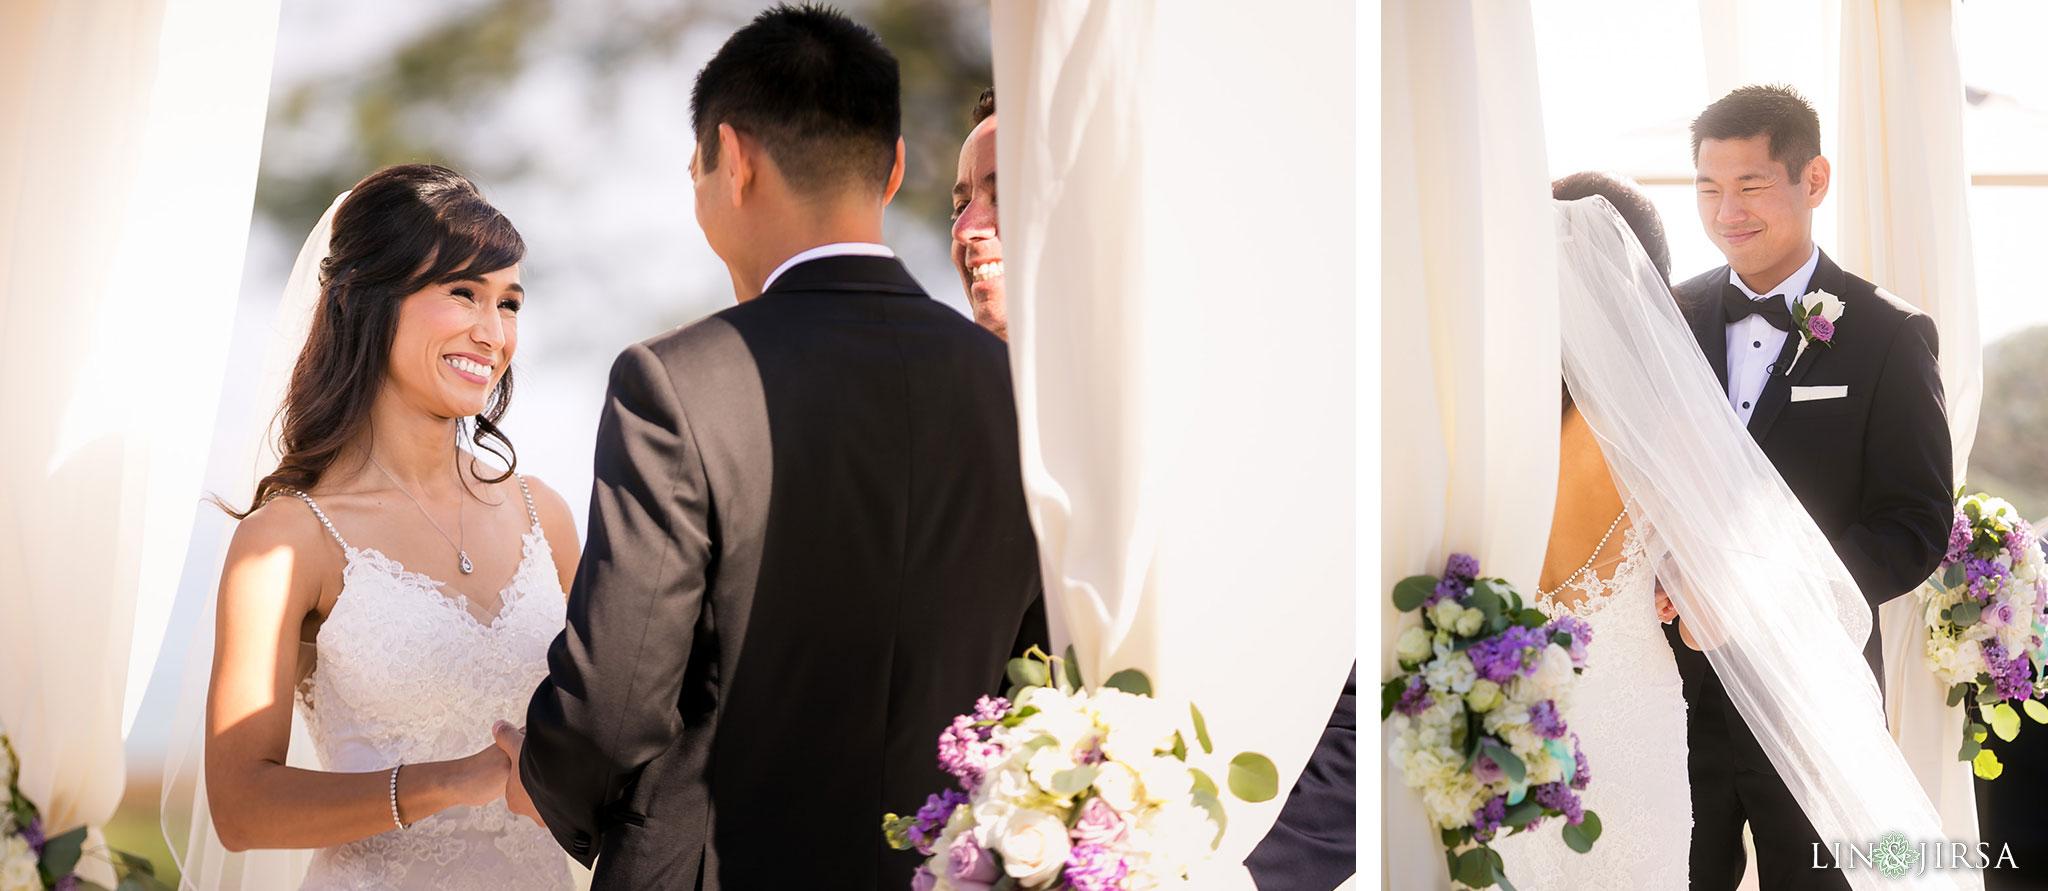 22 laguna cliffs marriott dana point wedding ceremony photography